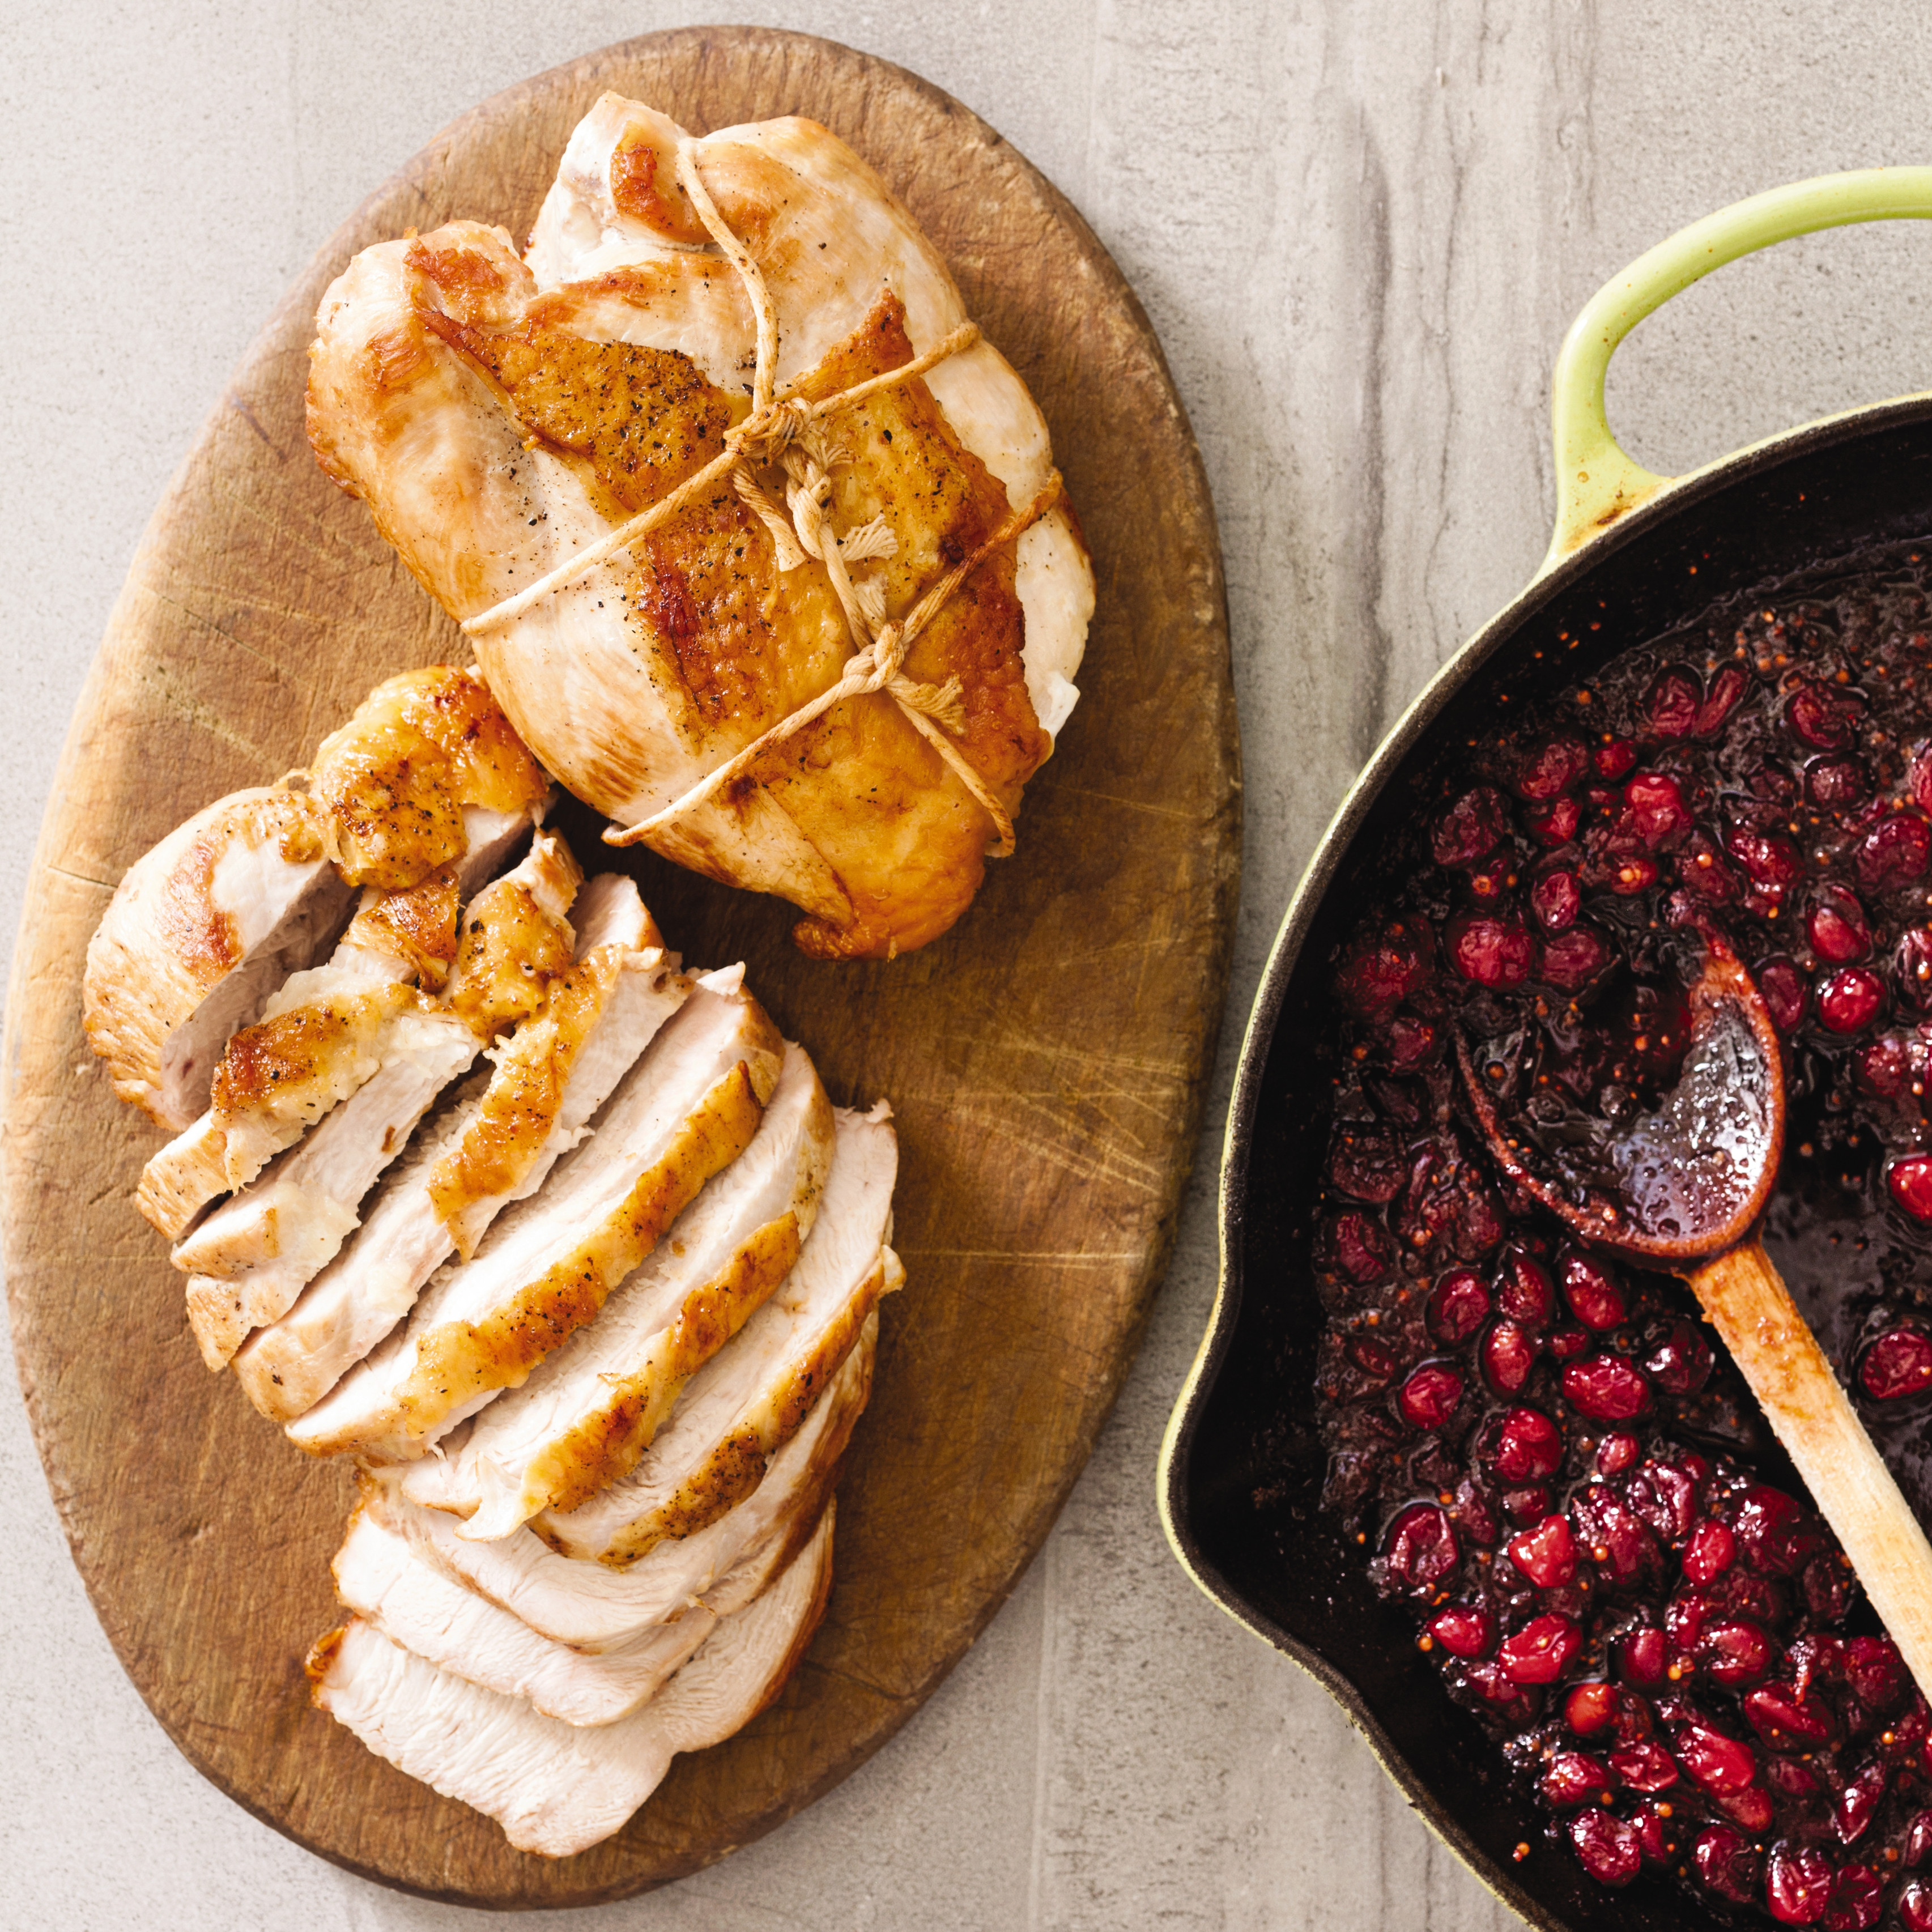 Americas Test Kitchen Thanksgiving Turkey  Cast Iron Boneless Turkey Breasts with Cranberry Chutney